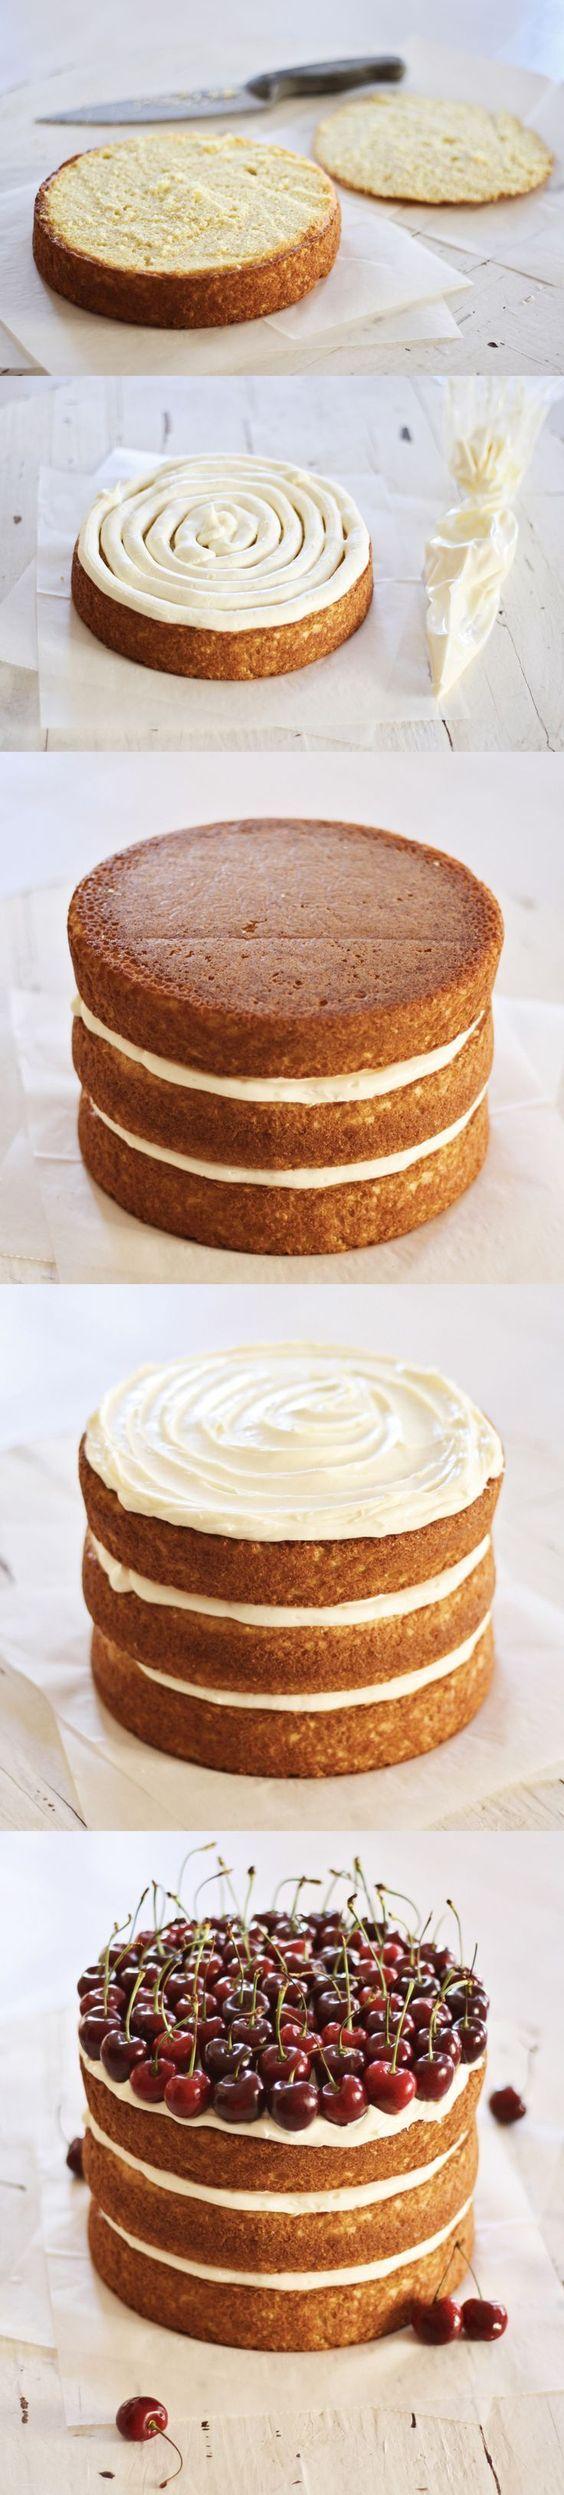 Manna Cake - The Simplest Recipes 23